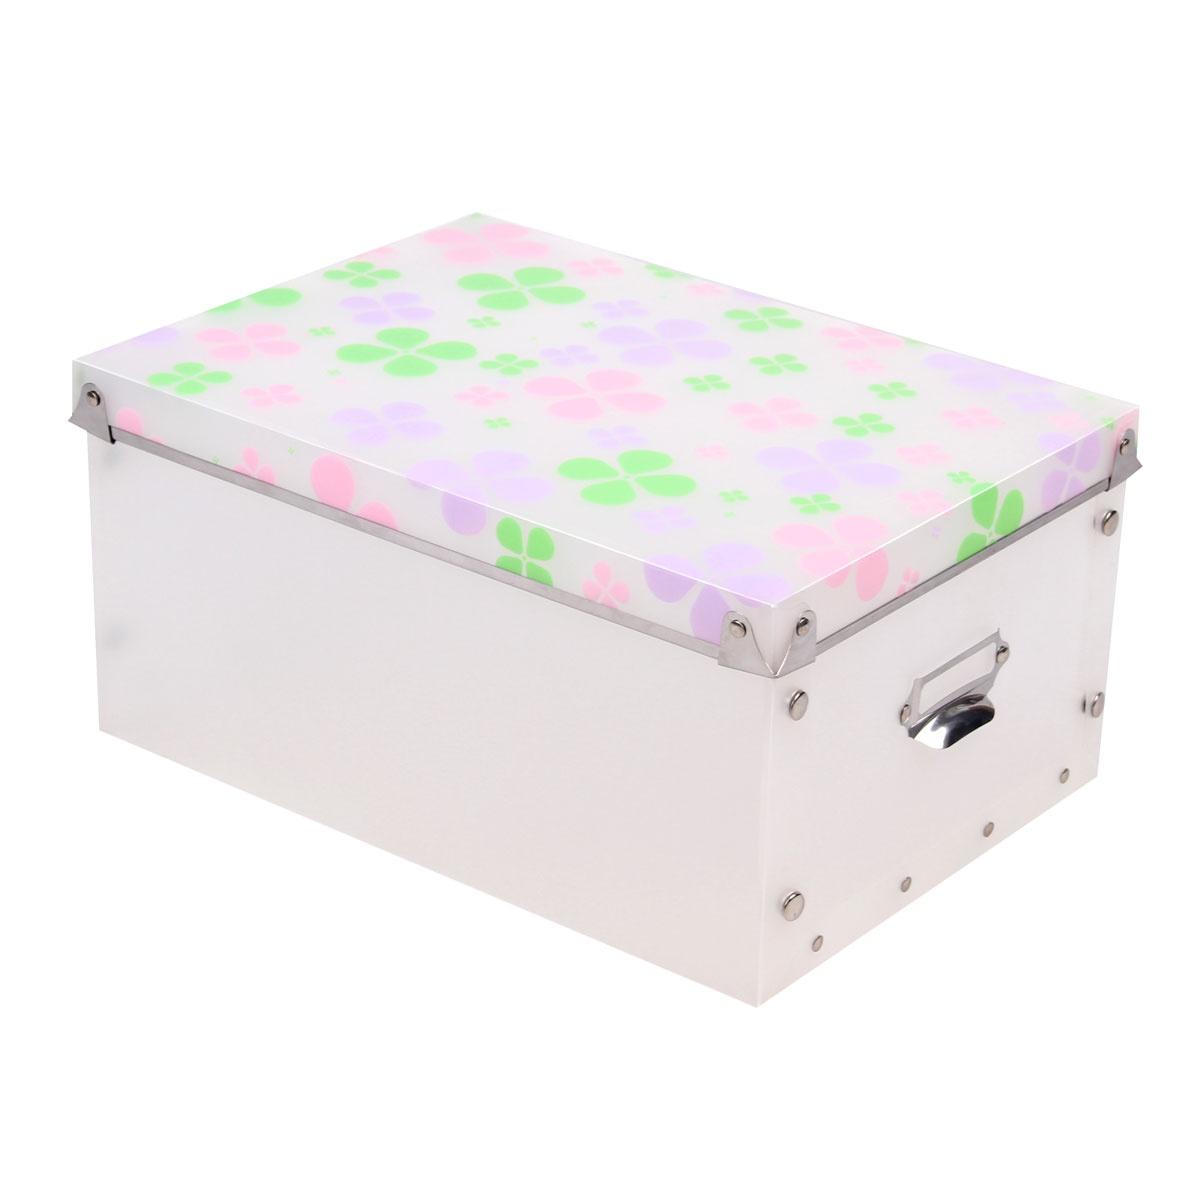 Коробка для хранения Miolla складная, белый короб для xранения обуви miolla 52 x 30 x 11 см